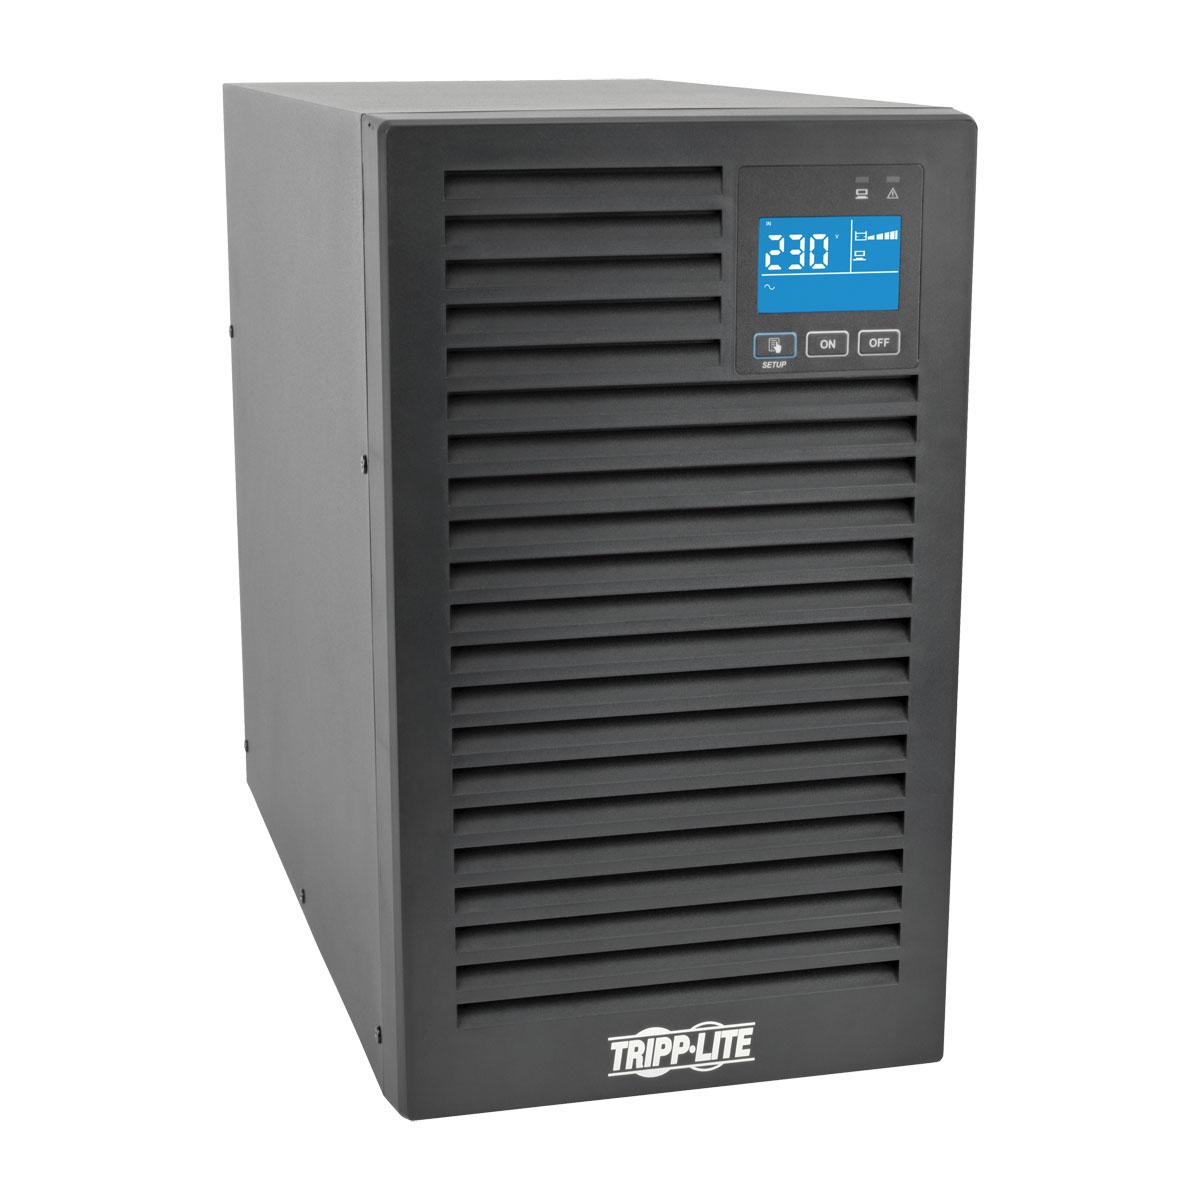 Tripp Lite 2000VA 1800W SmartOnline 230V On-Line Double